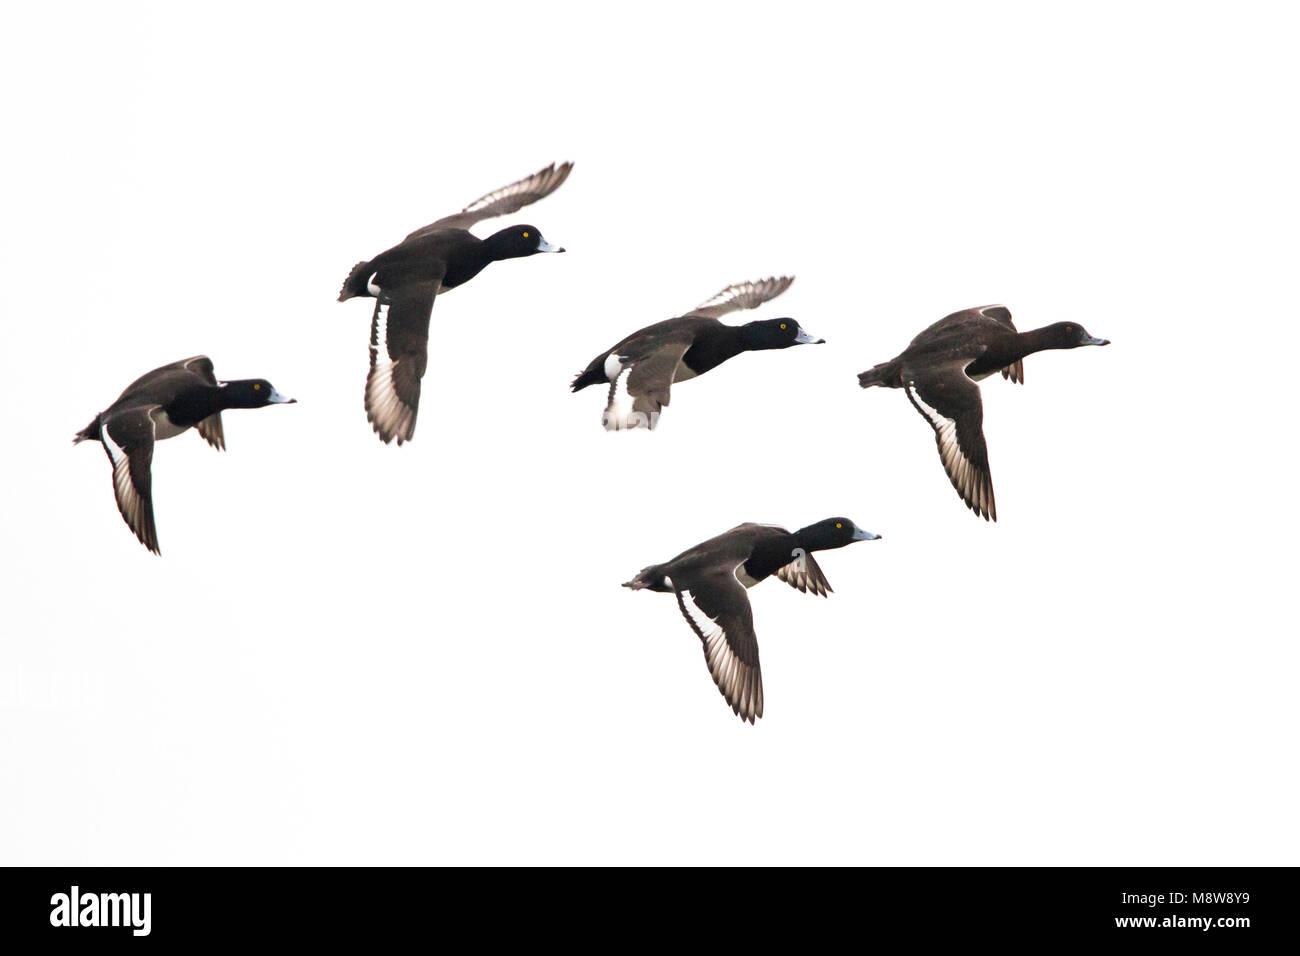 Kuifeend groep vliegend; Tufted Duck flock flying - Stock Image